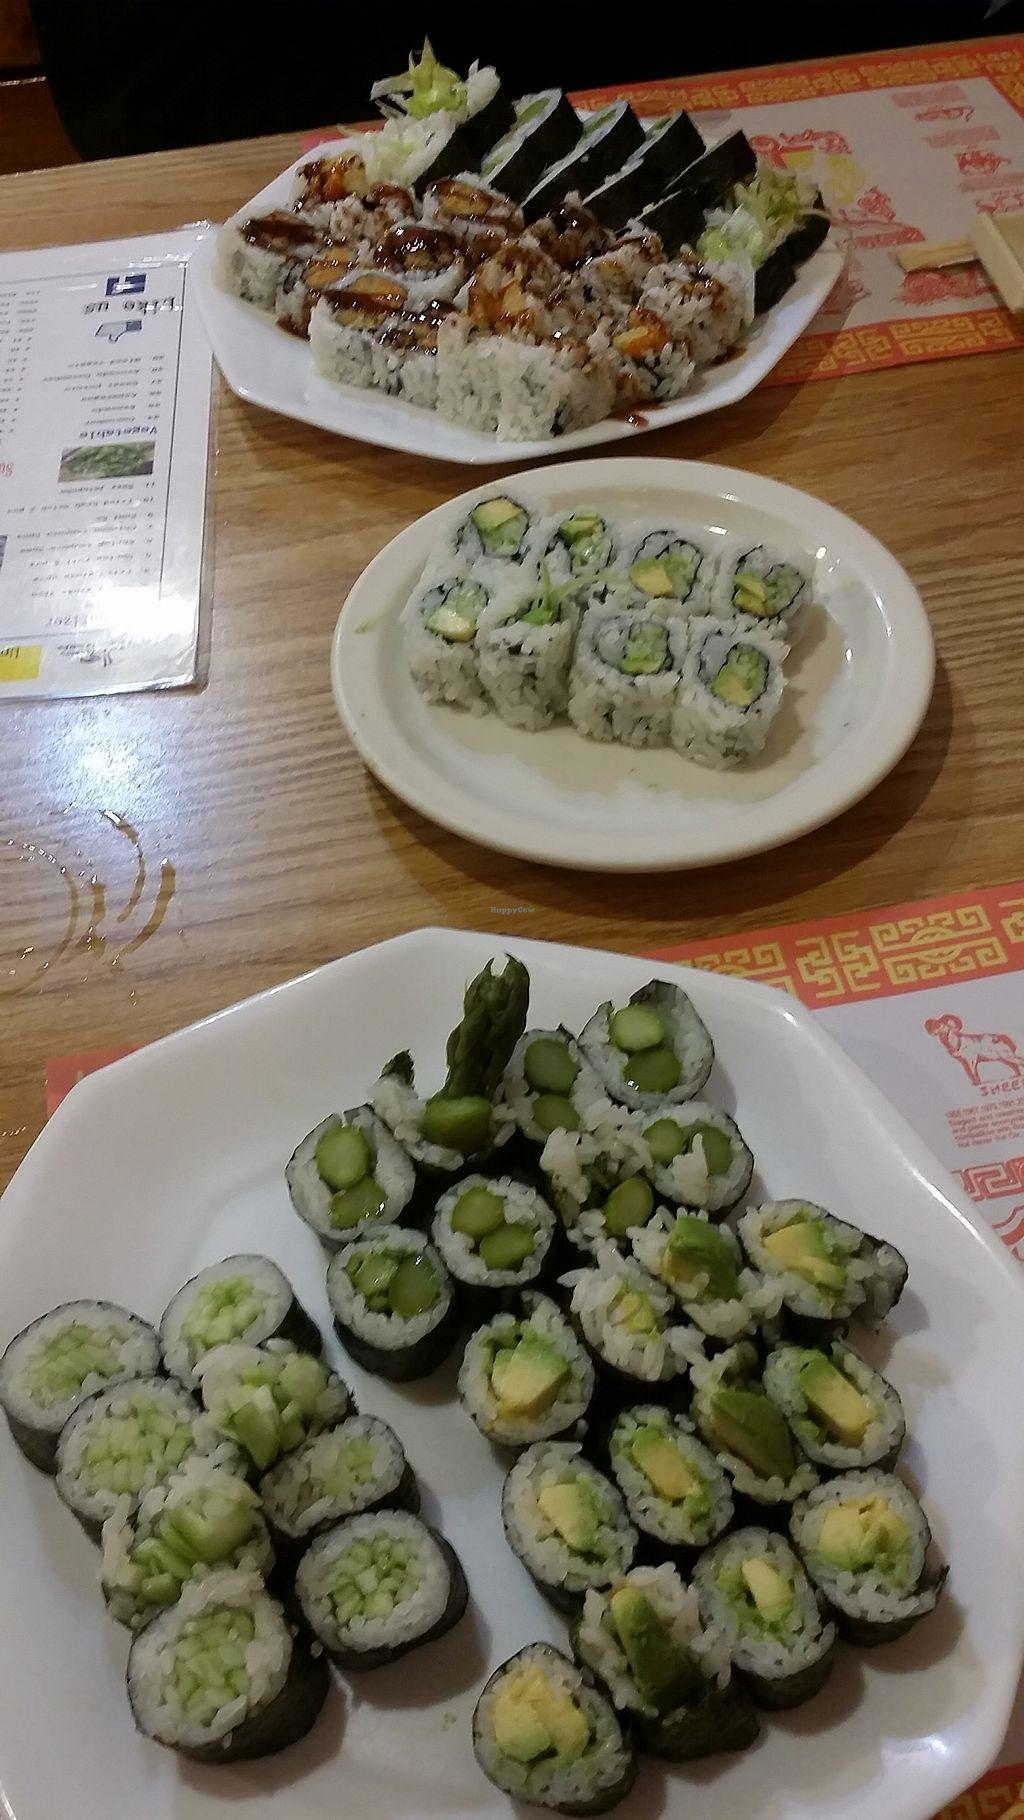 "Photo of Sushi Factory  by <a href=""/members/profile/maltinej"">maltinej</a> <br/>avocado rolls, asparagus rolls, sweet potato tempura rolls <br/> February 20, 2018  - <a href='/contact/abuse/image/112491/361518'>Report</a>"